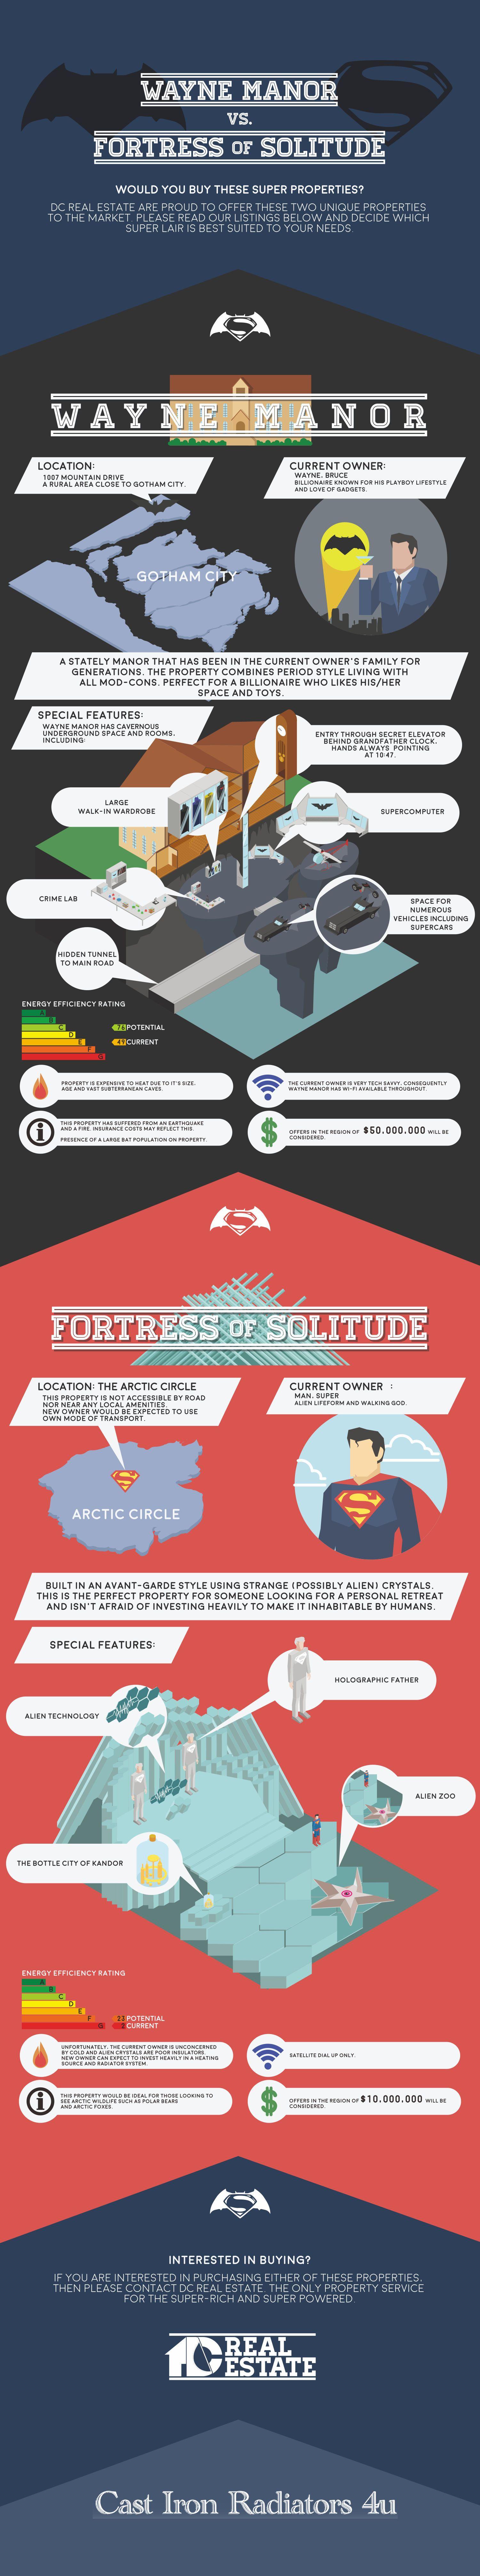 Wayne Manor vs Fortress of Solitude